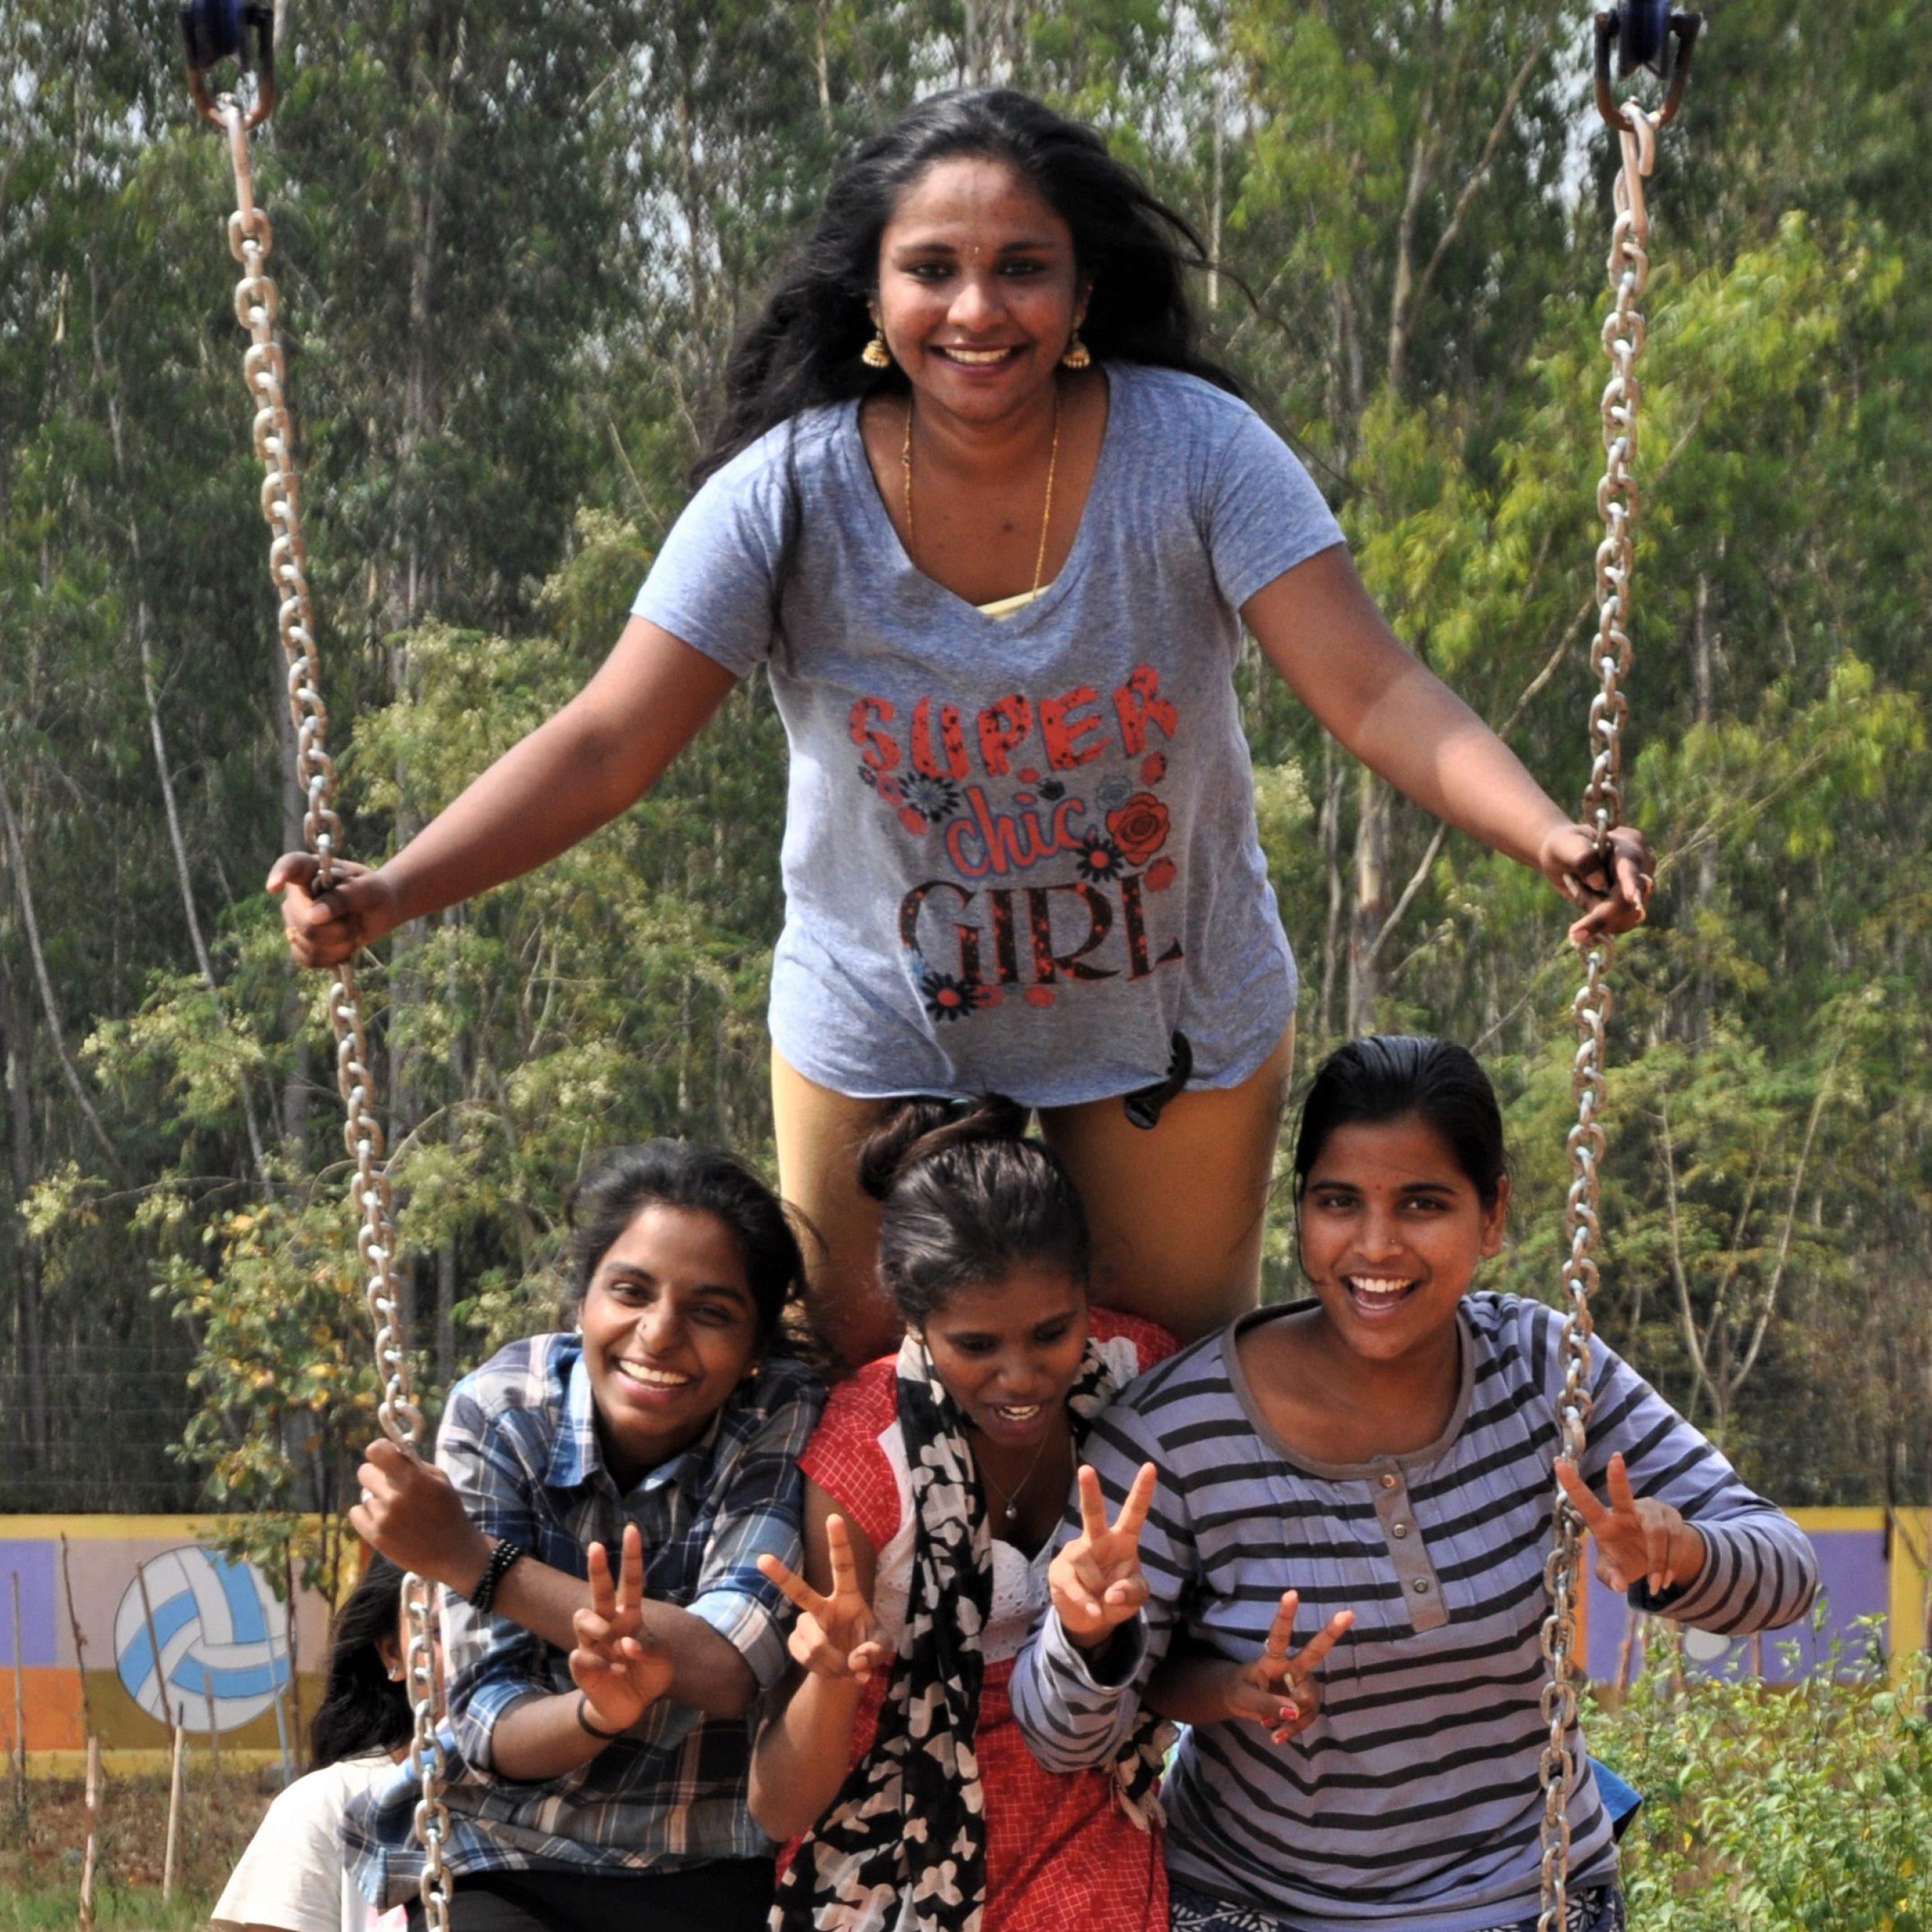 Girls on rope swing_01